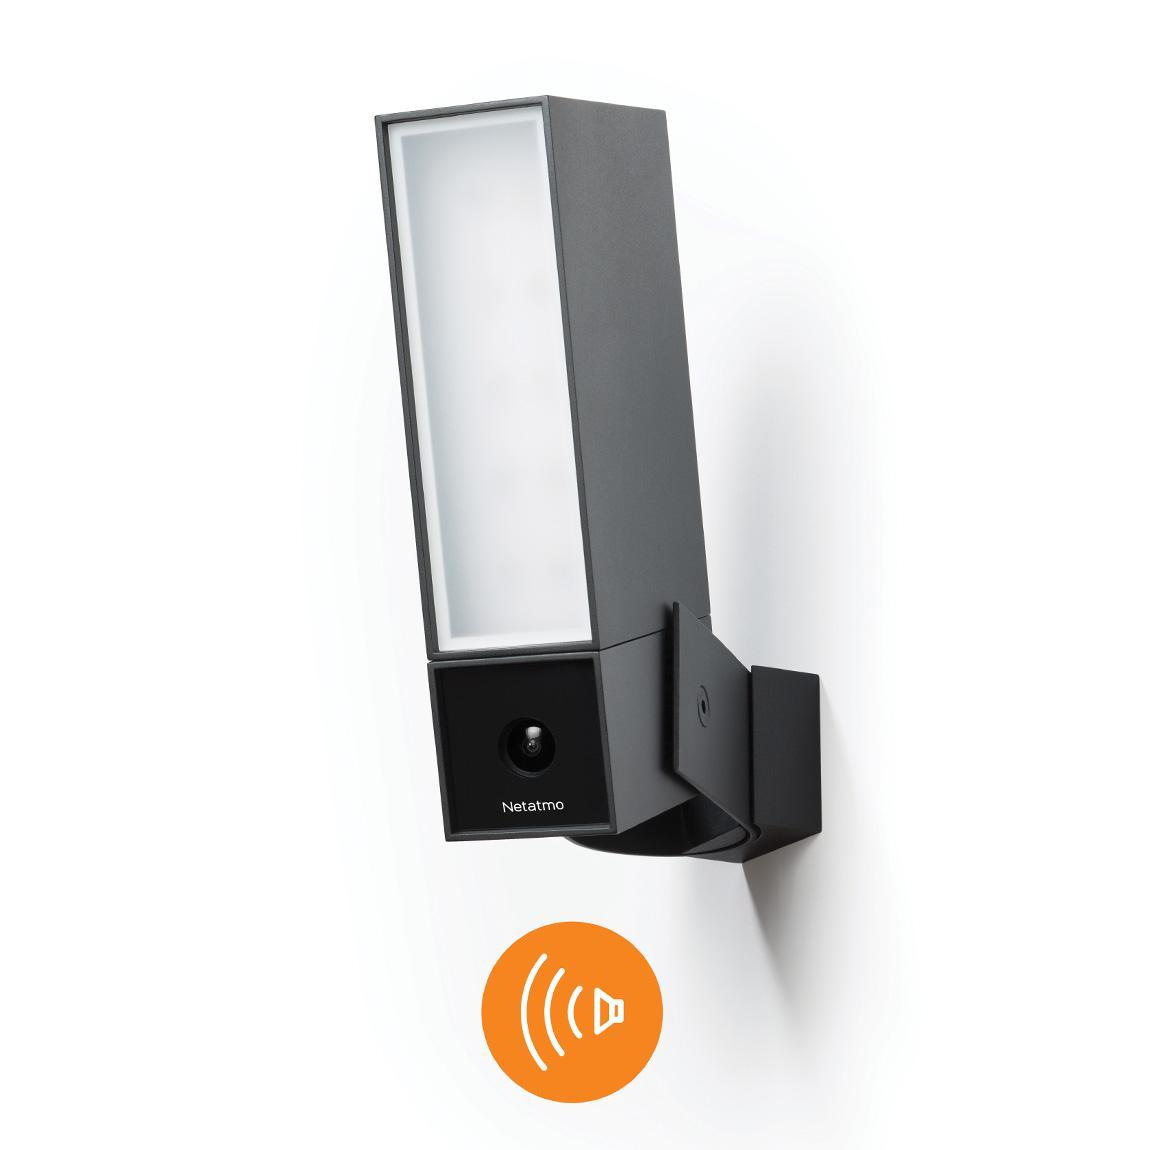 Netatmo Smarte Außenkamera mit Alarmsirene - Schwarz